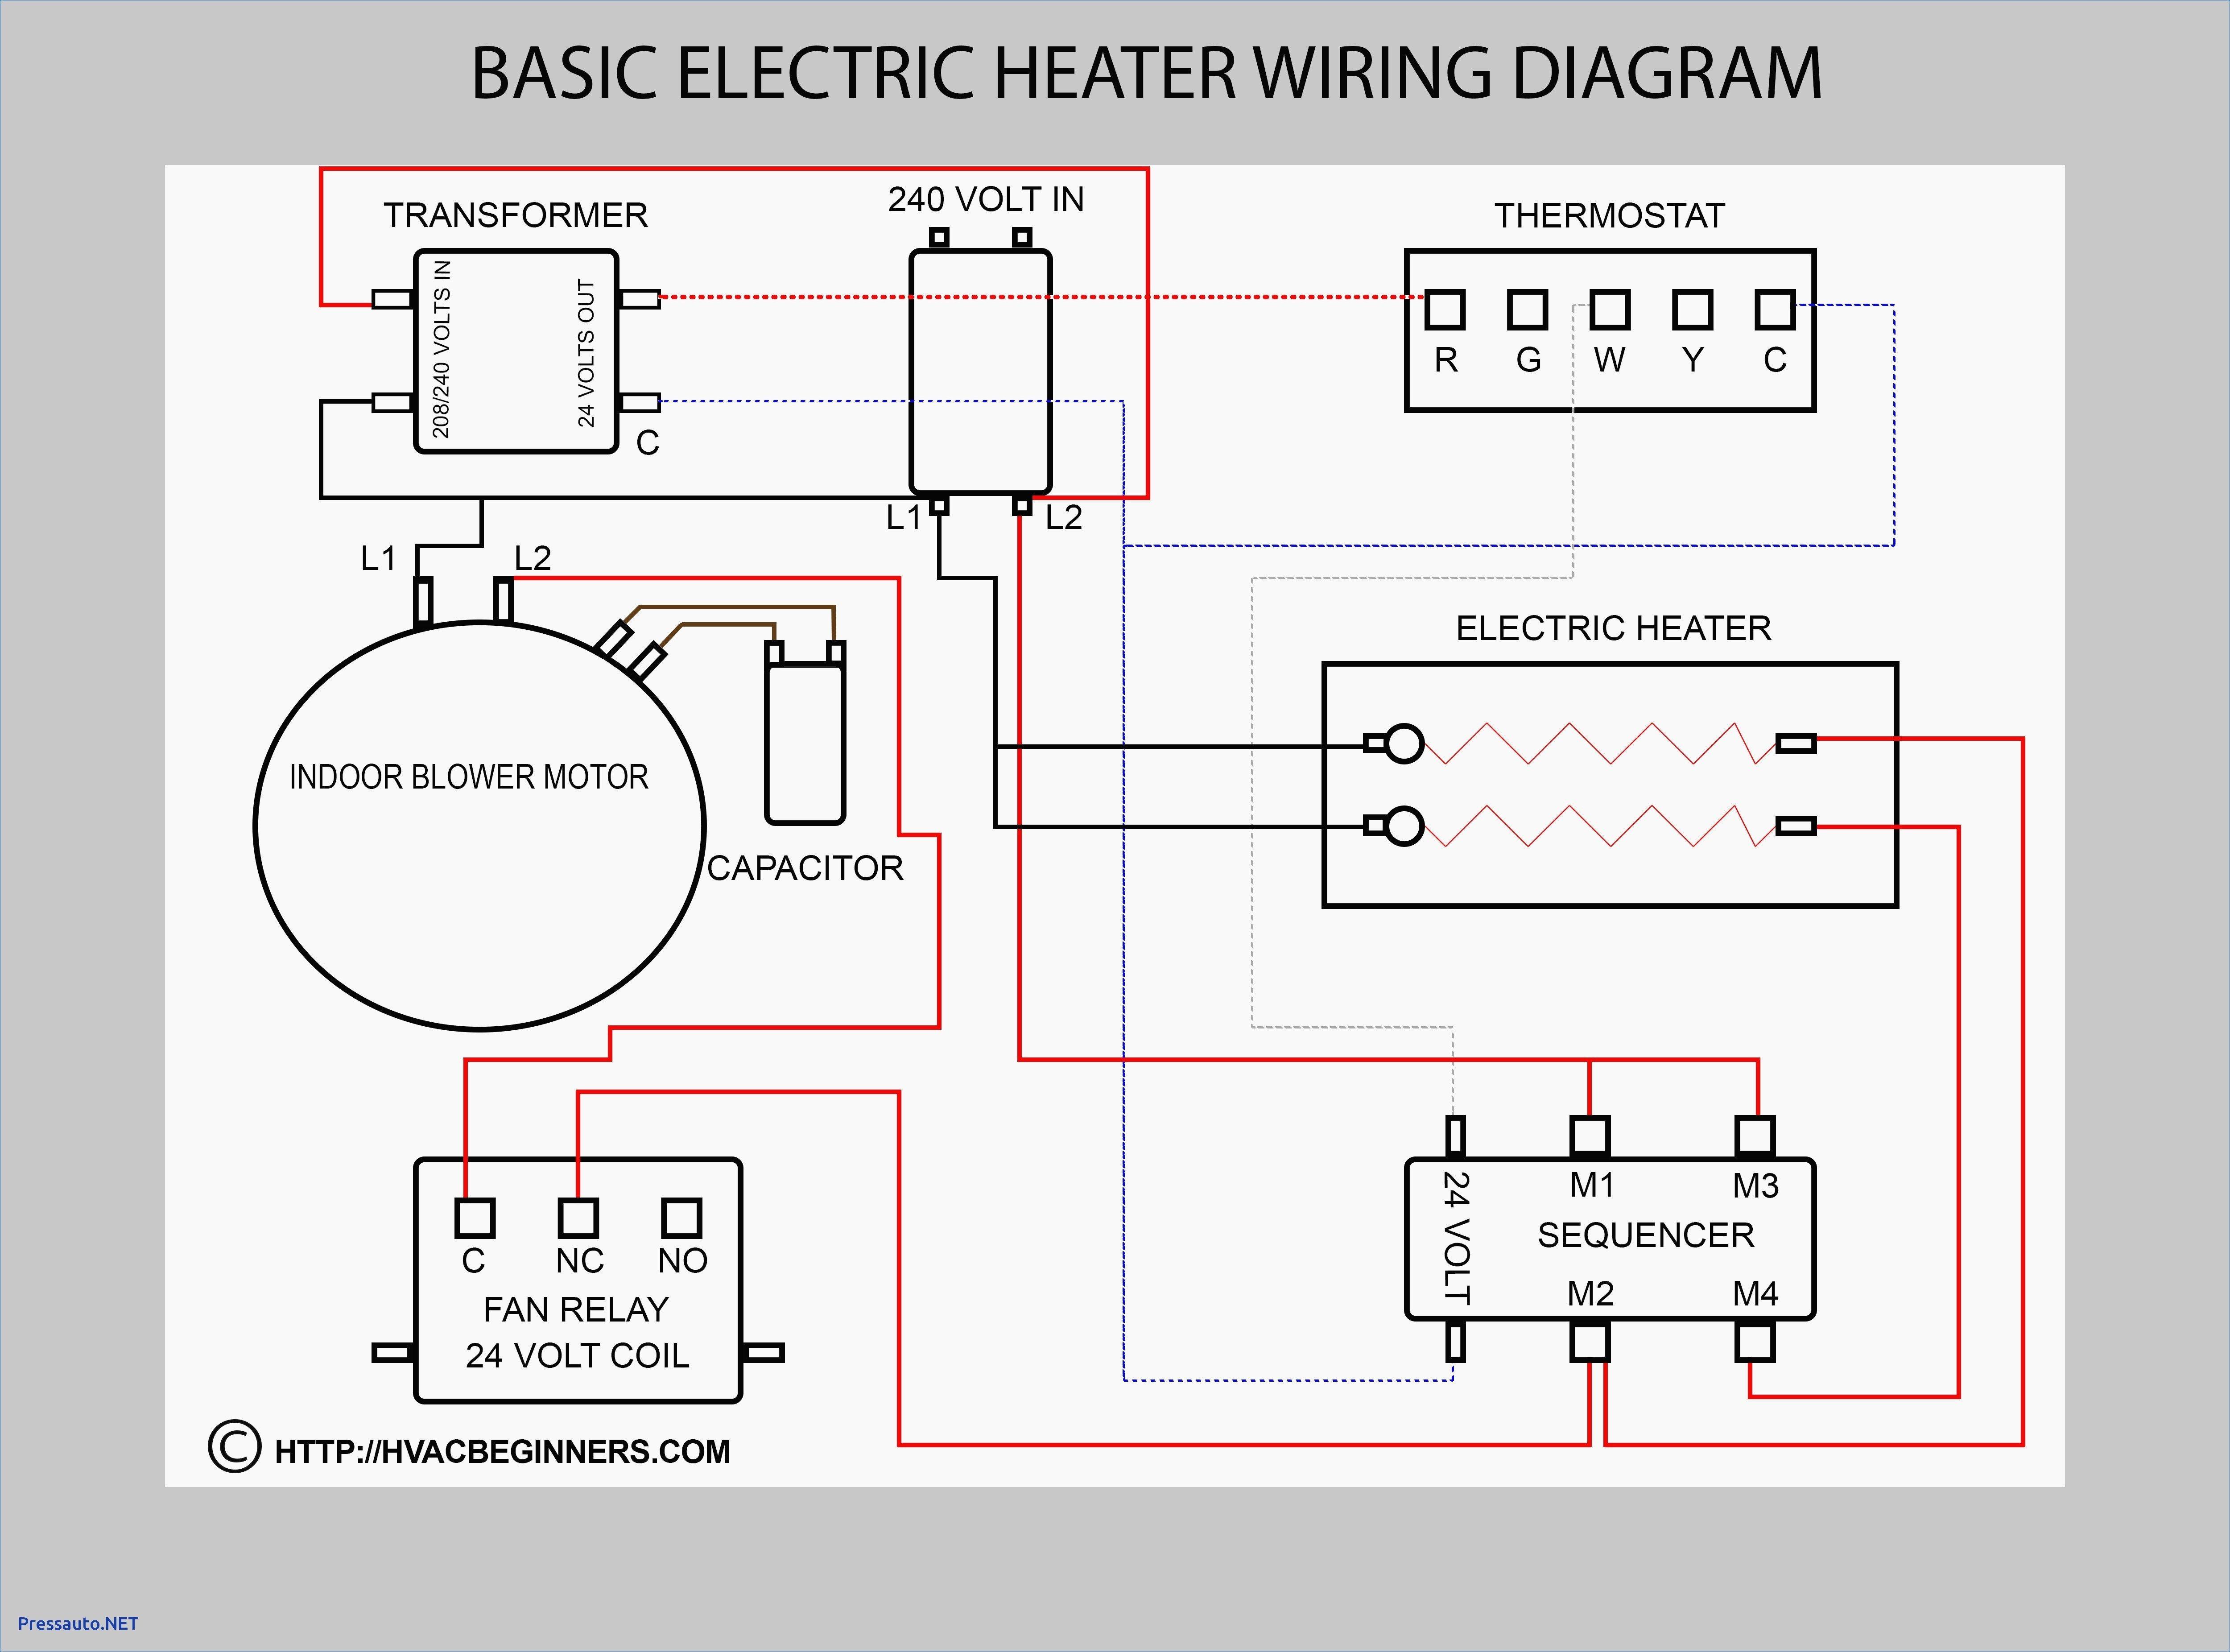 Wiring Diagram For 220 Volt Baseboard Heater Basic